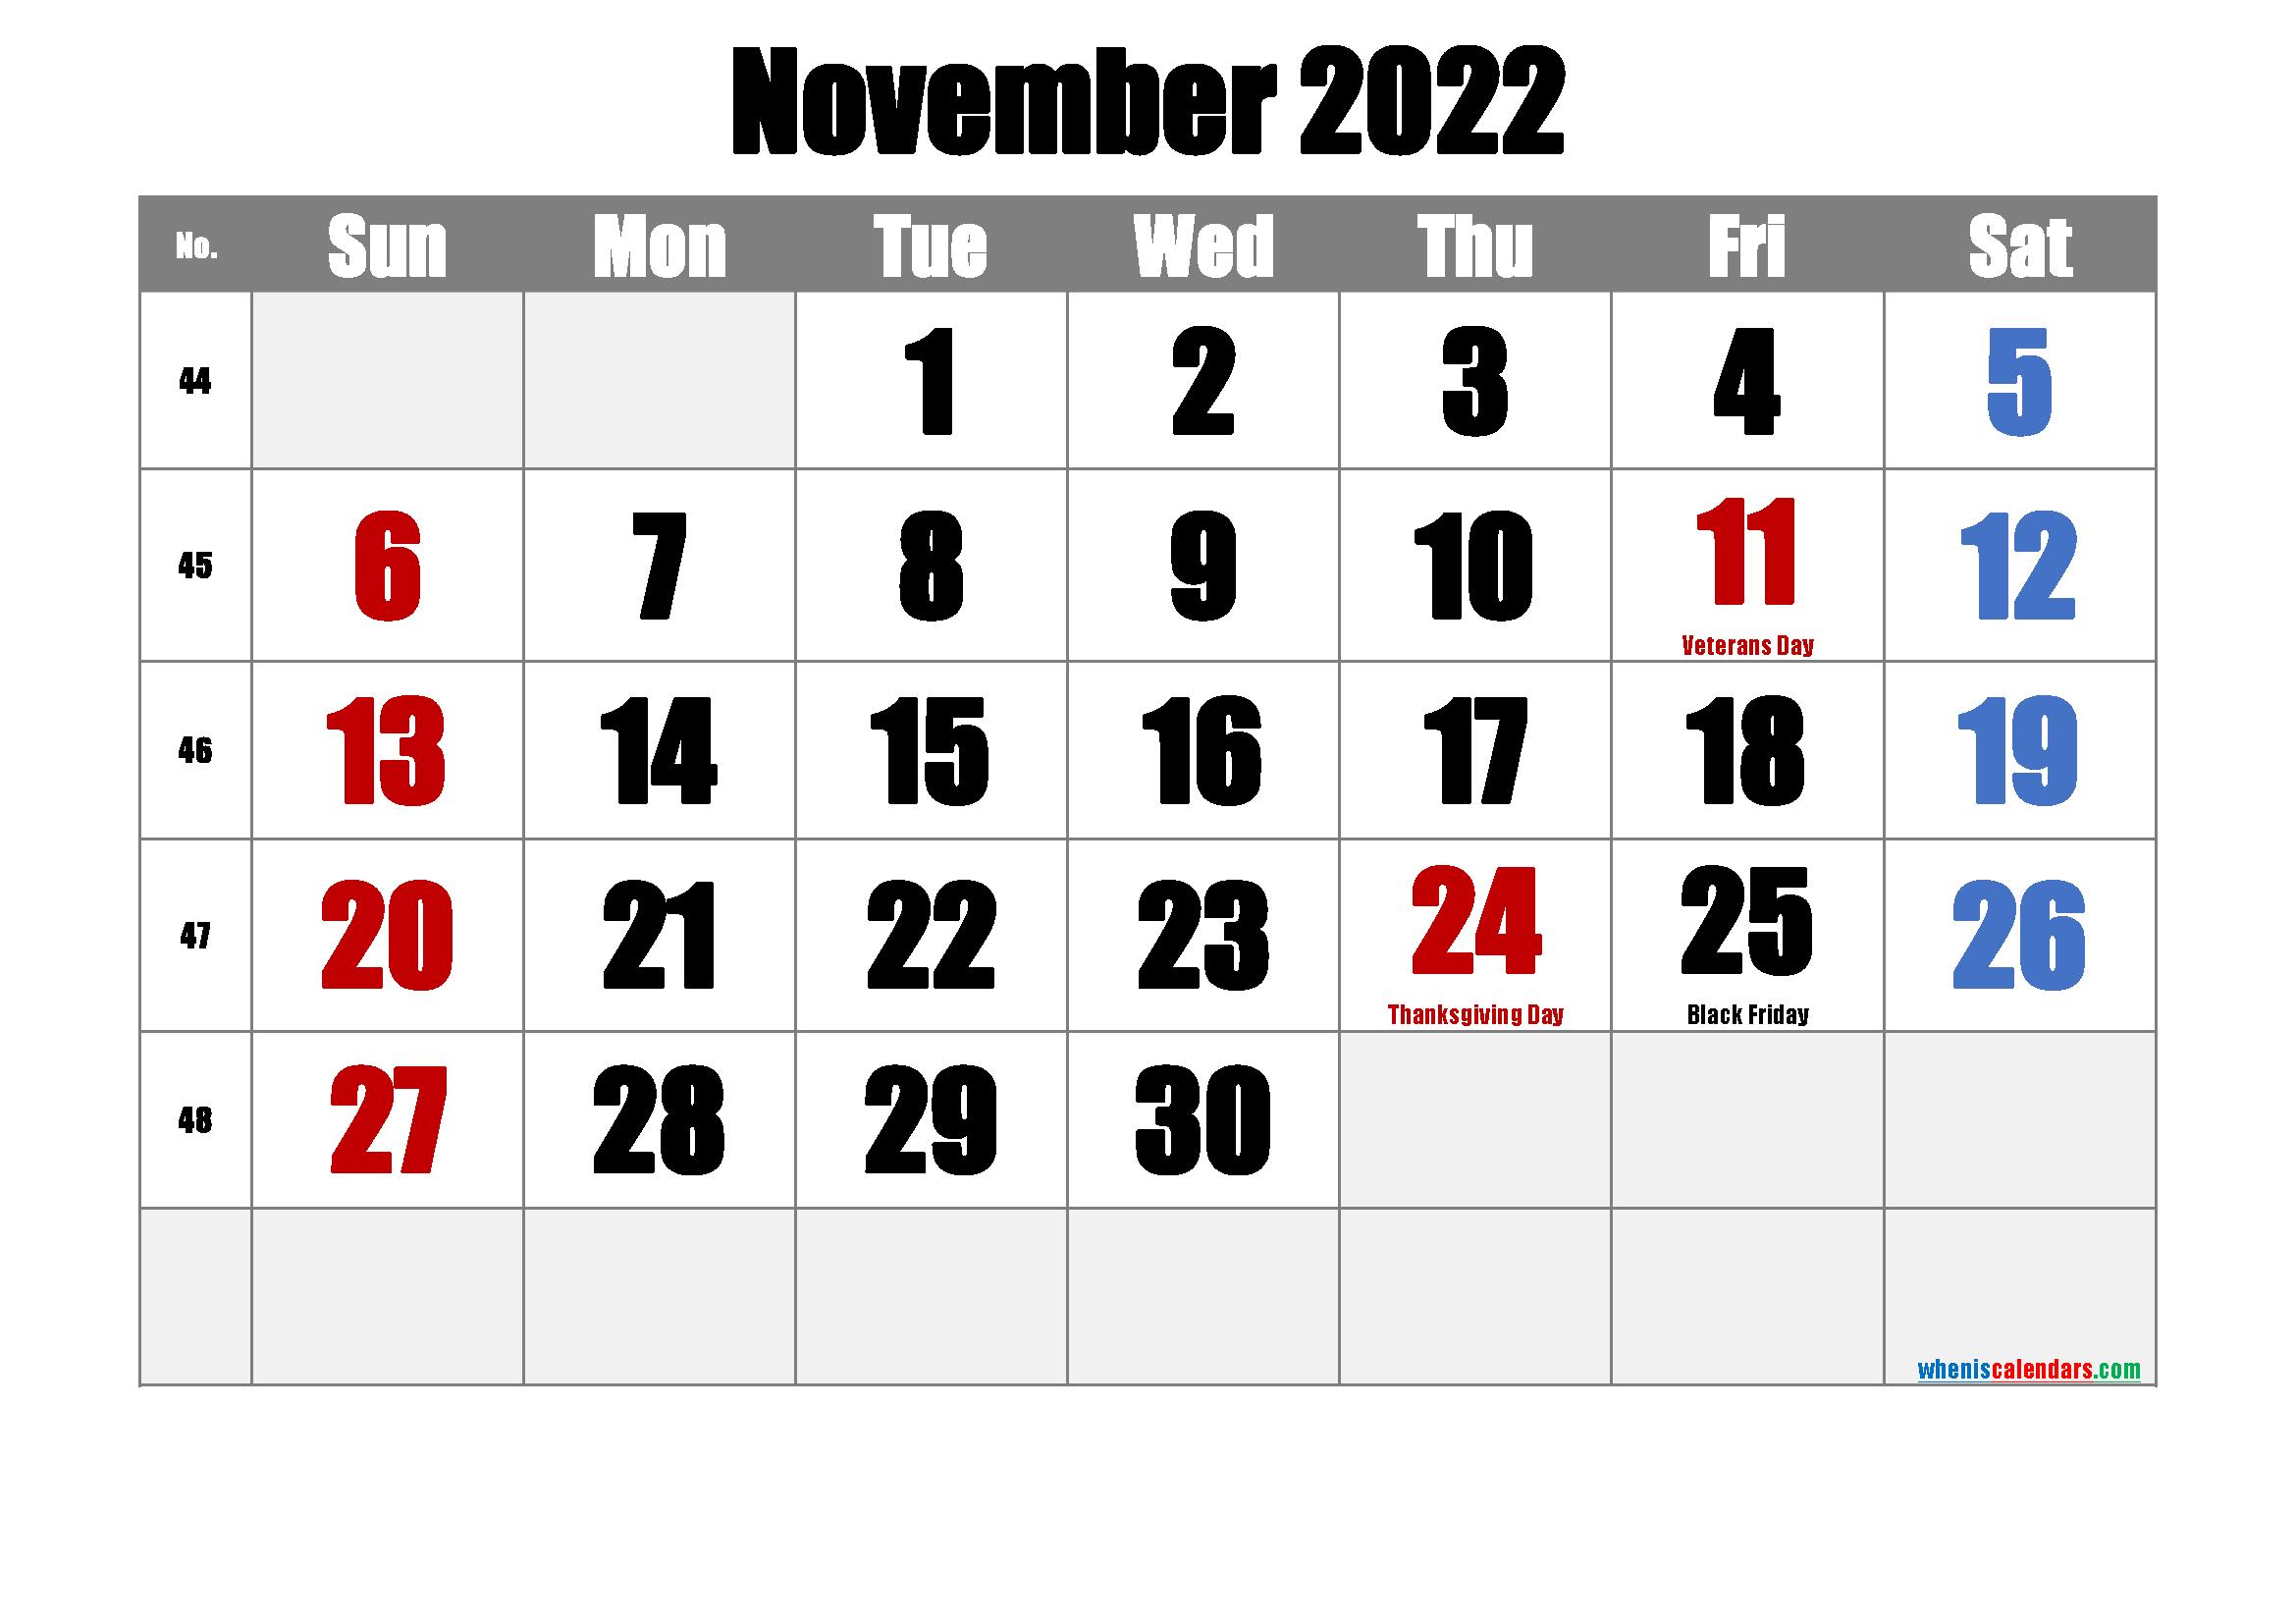 Free Printable Calendar November 2022.Free Printable November 2022 Calendar Pdf And Png Calendar Printables Calendar Printables